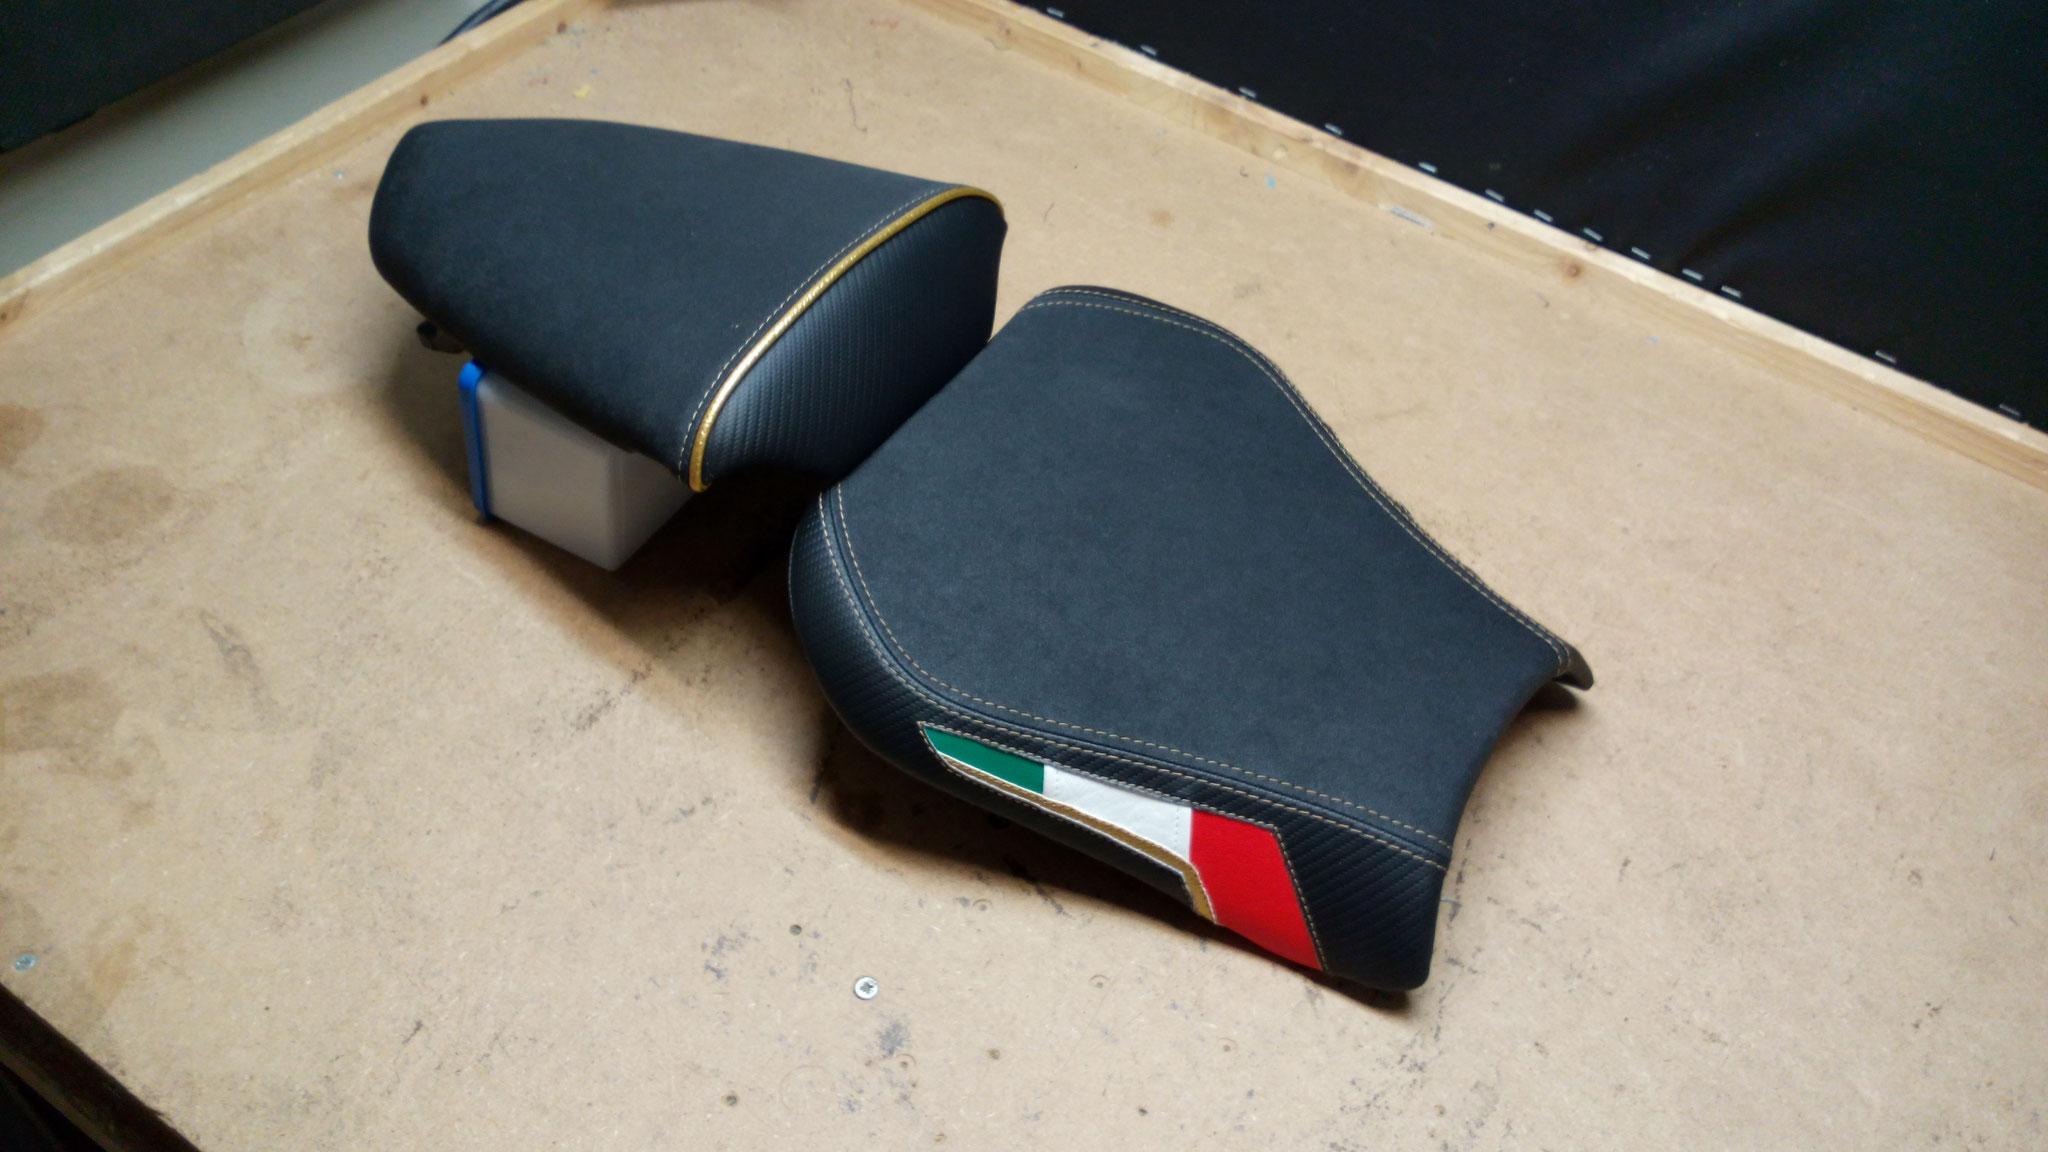 sattler polsterer sitzbank neu beziehen motorradsattler komfortsitze spezialanfertigungen. Black Bedroom Furniture Sets. Home Design Ideas